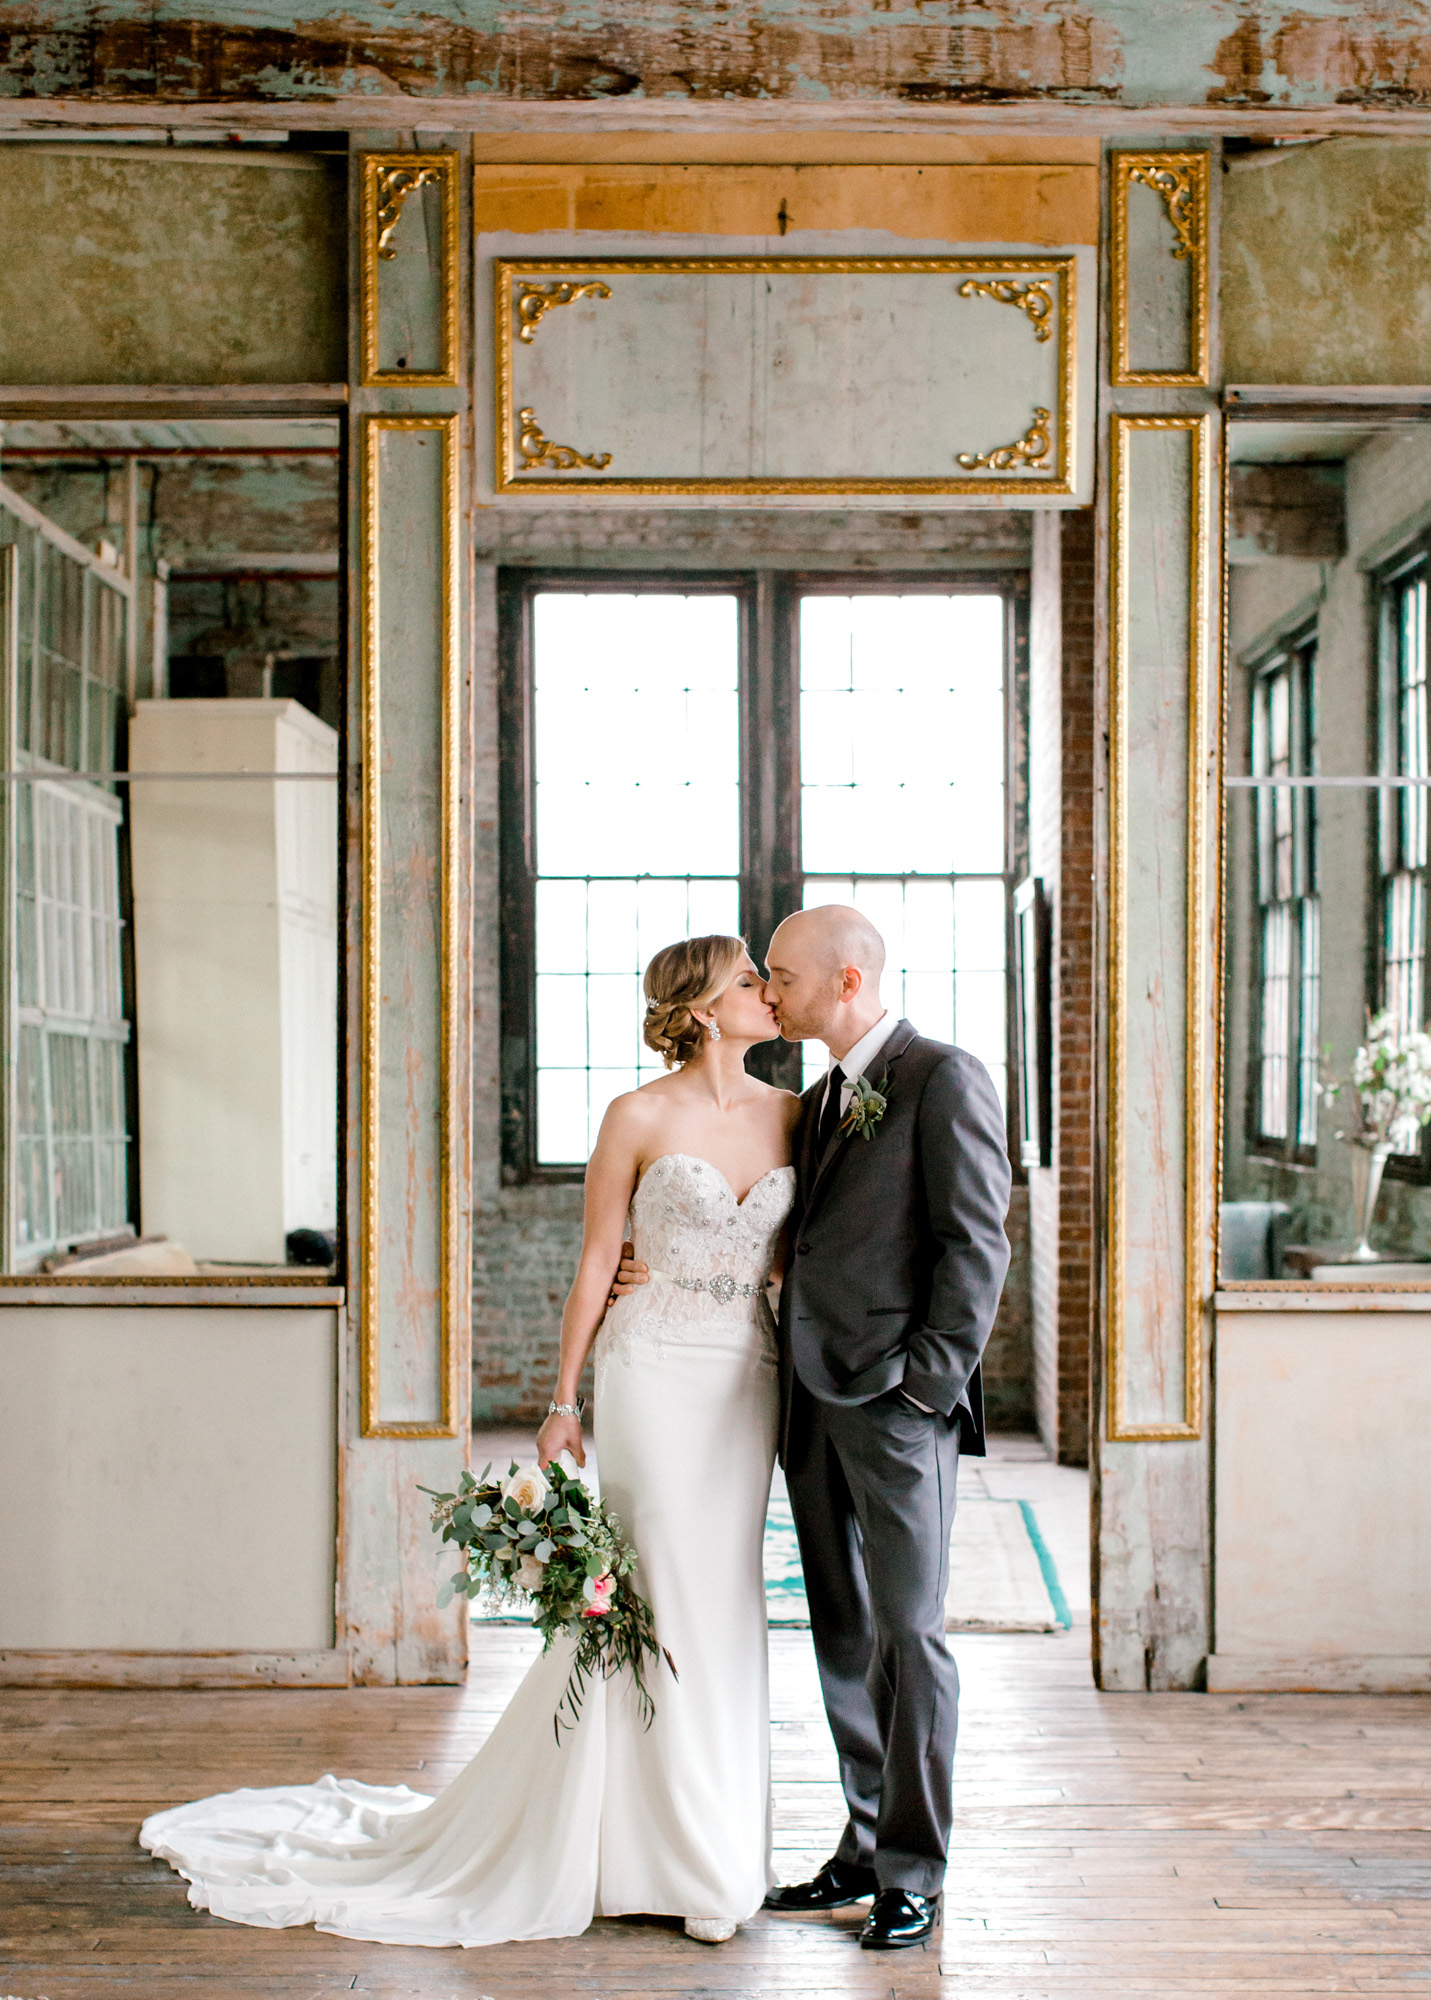 21_Metropolitan_Building_Wedding_LIC_Tanya_Salazar_Photography_001.jpg